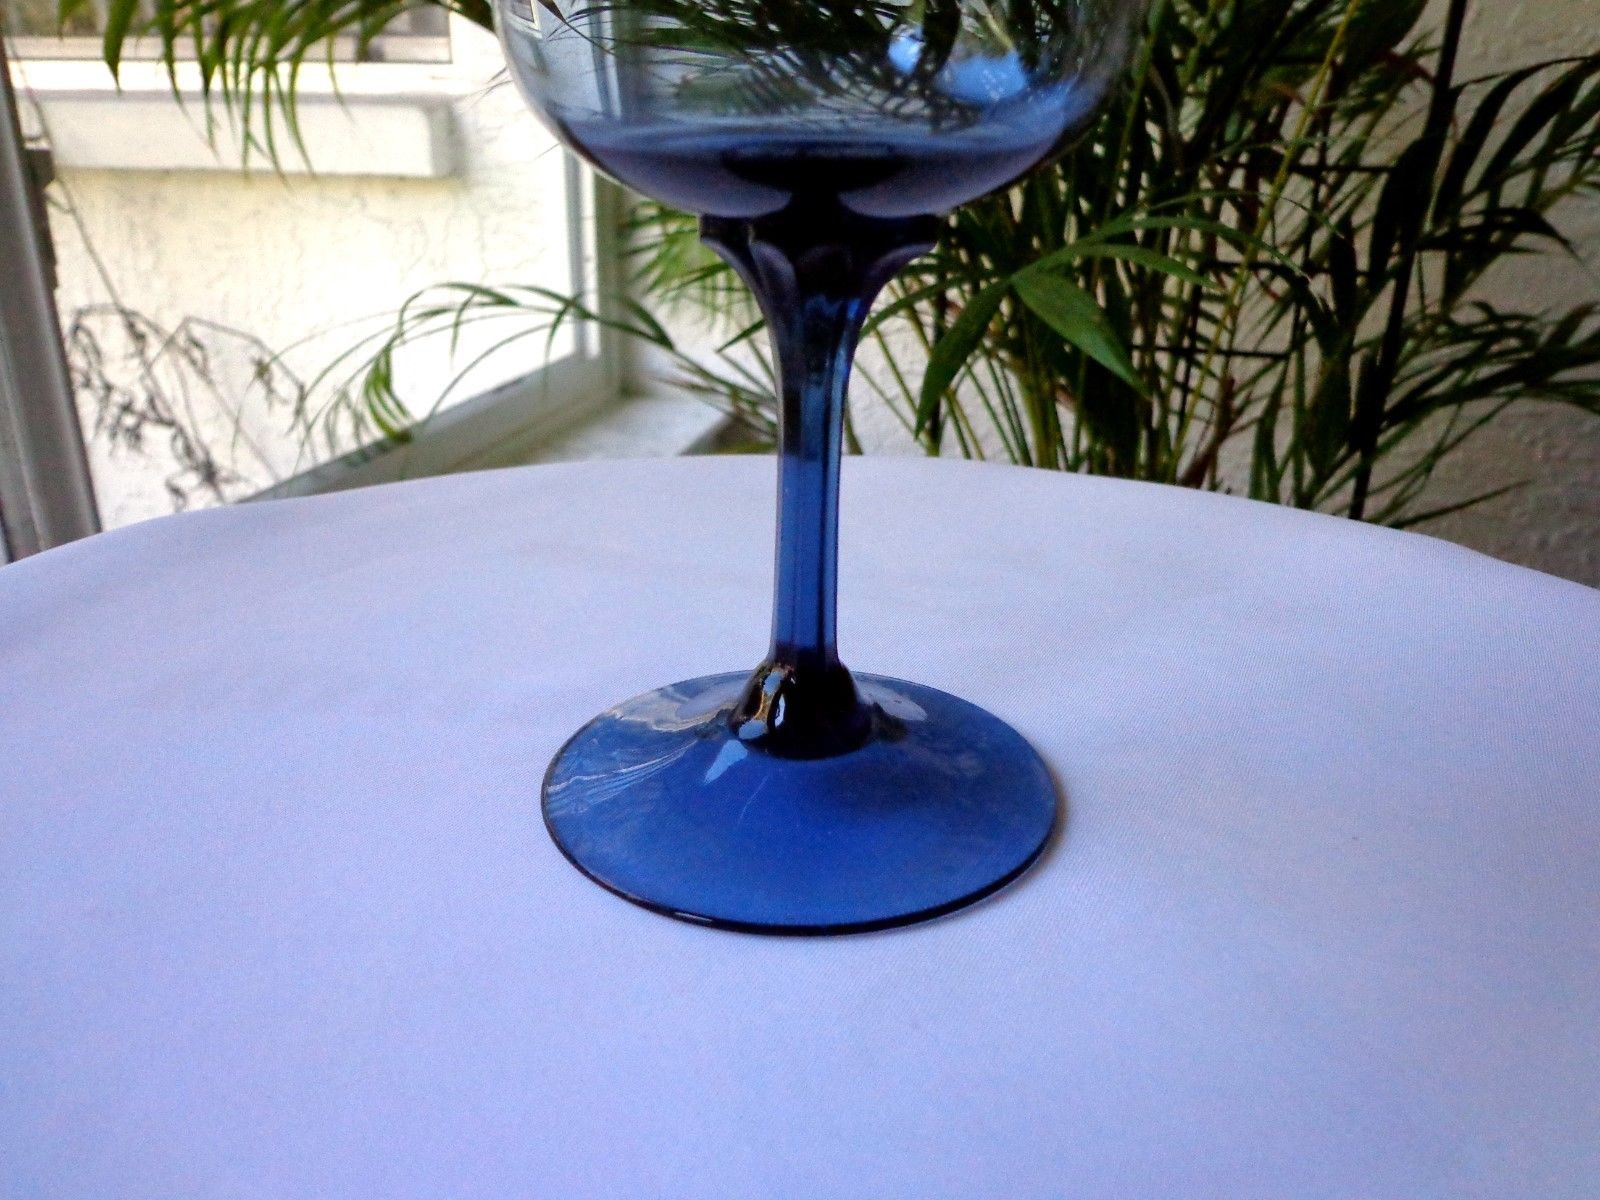 Lenox Blue Mist Crystal Water Goblet c 1974 - 1985